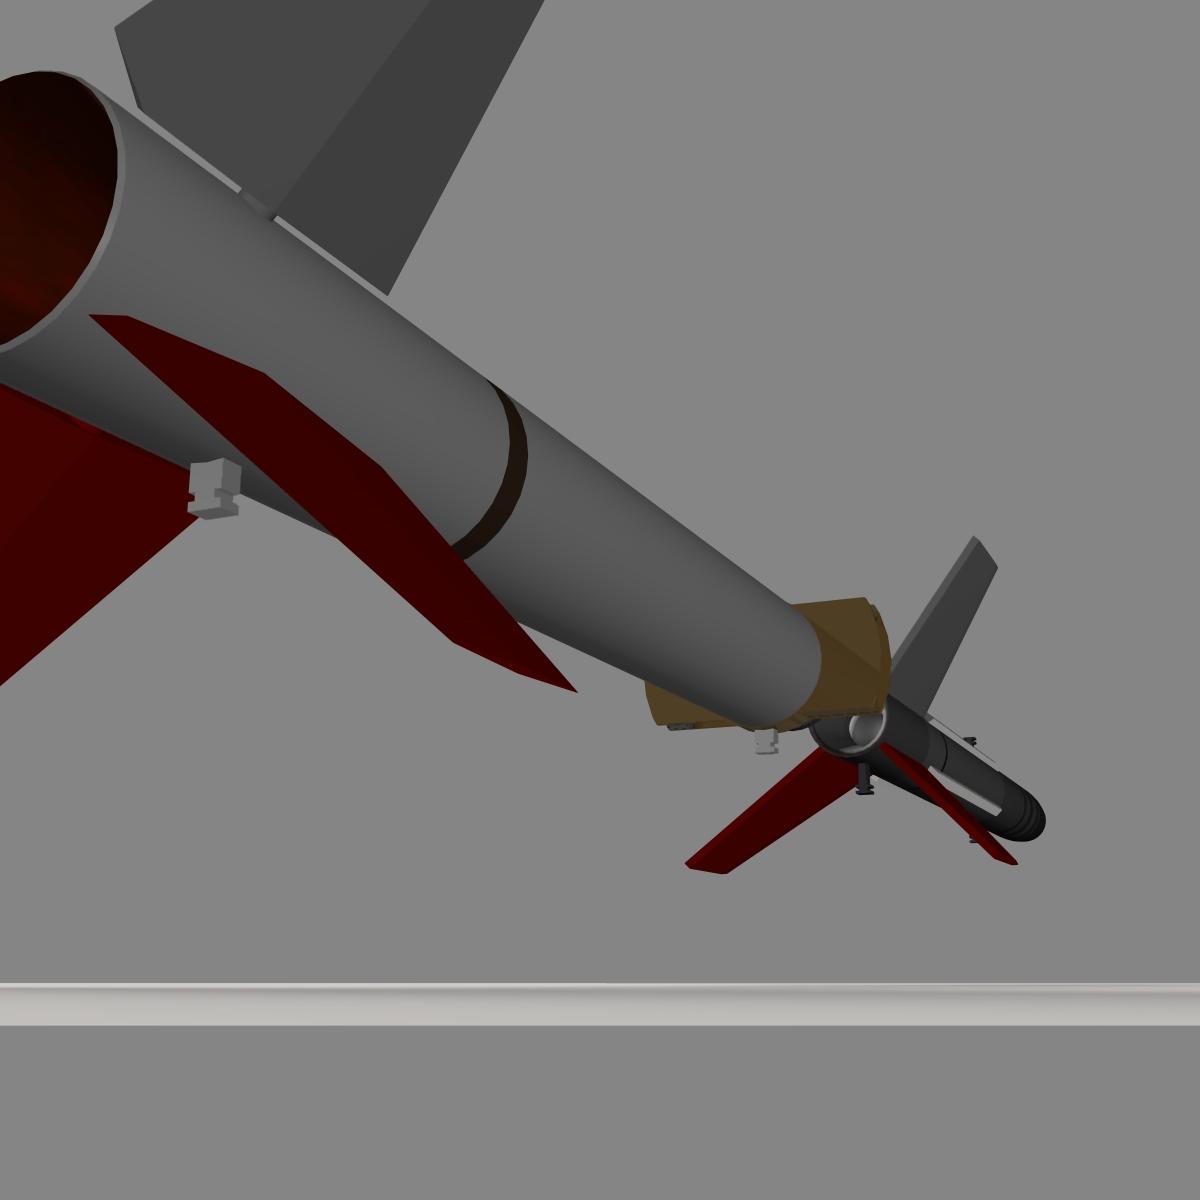 us terrier-lynx rocket 3d model 3ds dxf cob x obj 140327